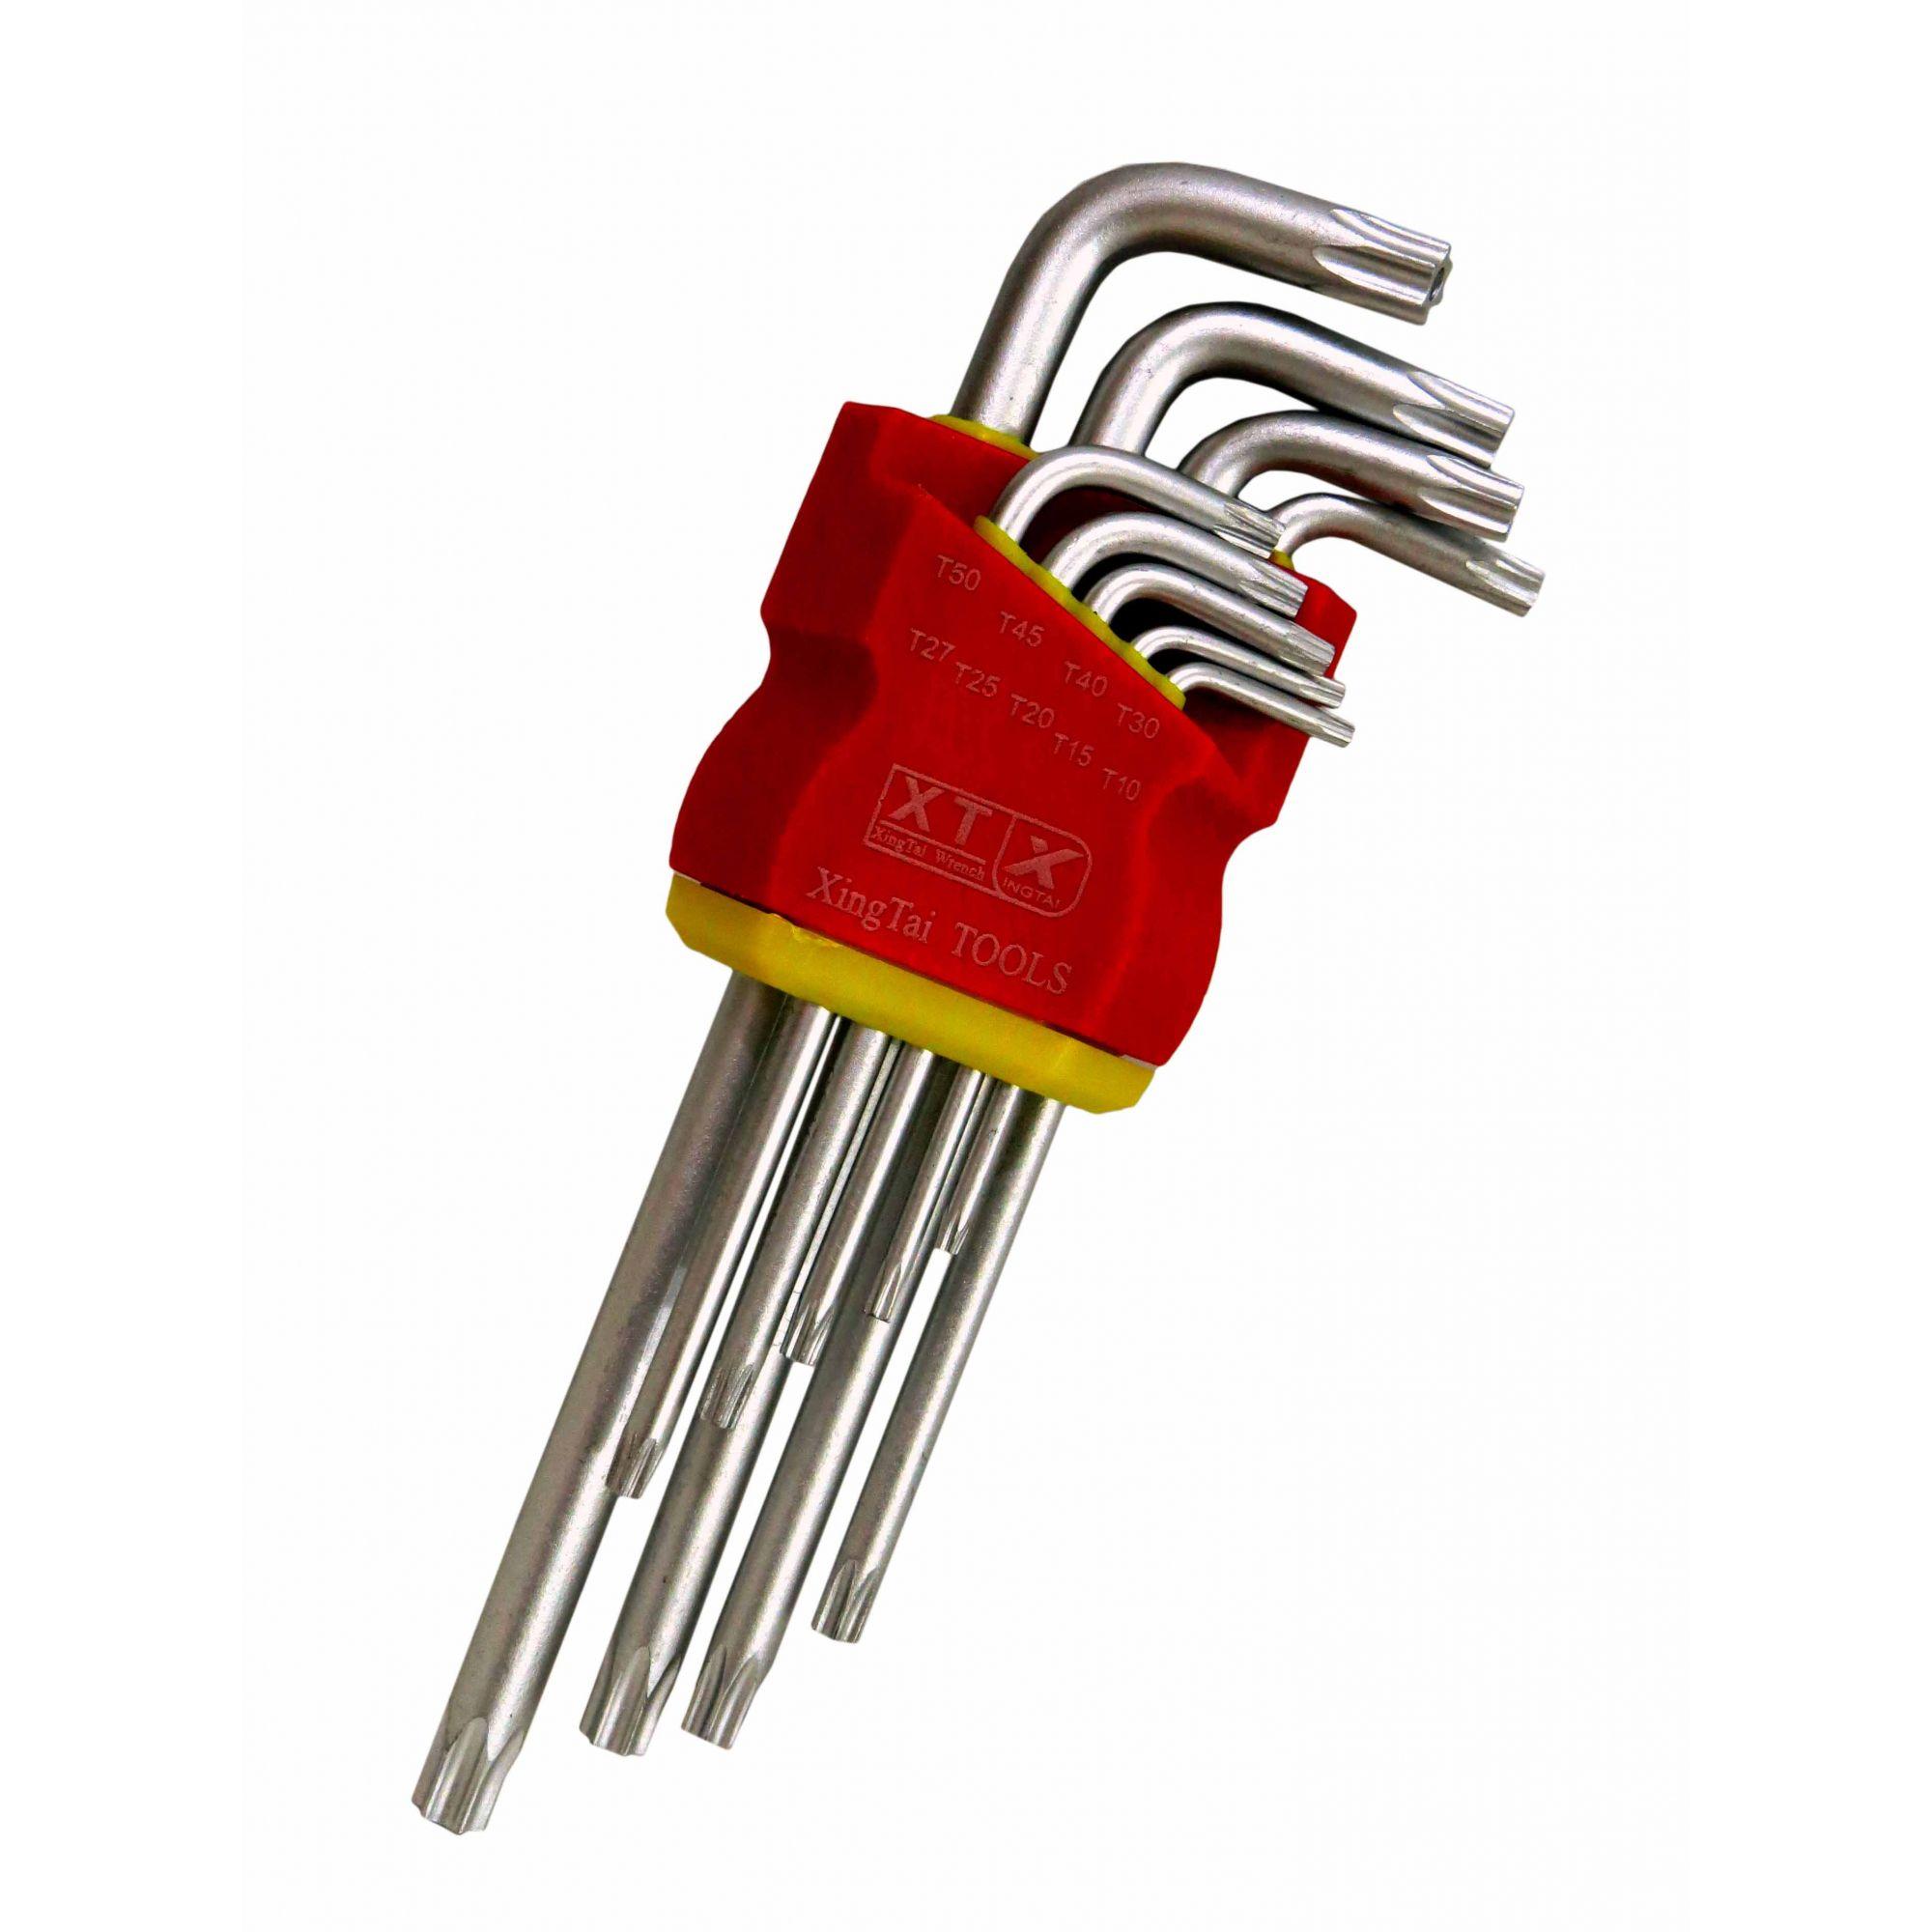 Jogo Kit Chave Torx 9 Peças Tipo L Estojo 1,5 10mm